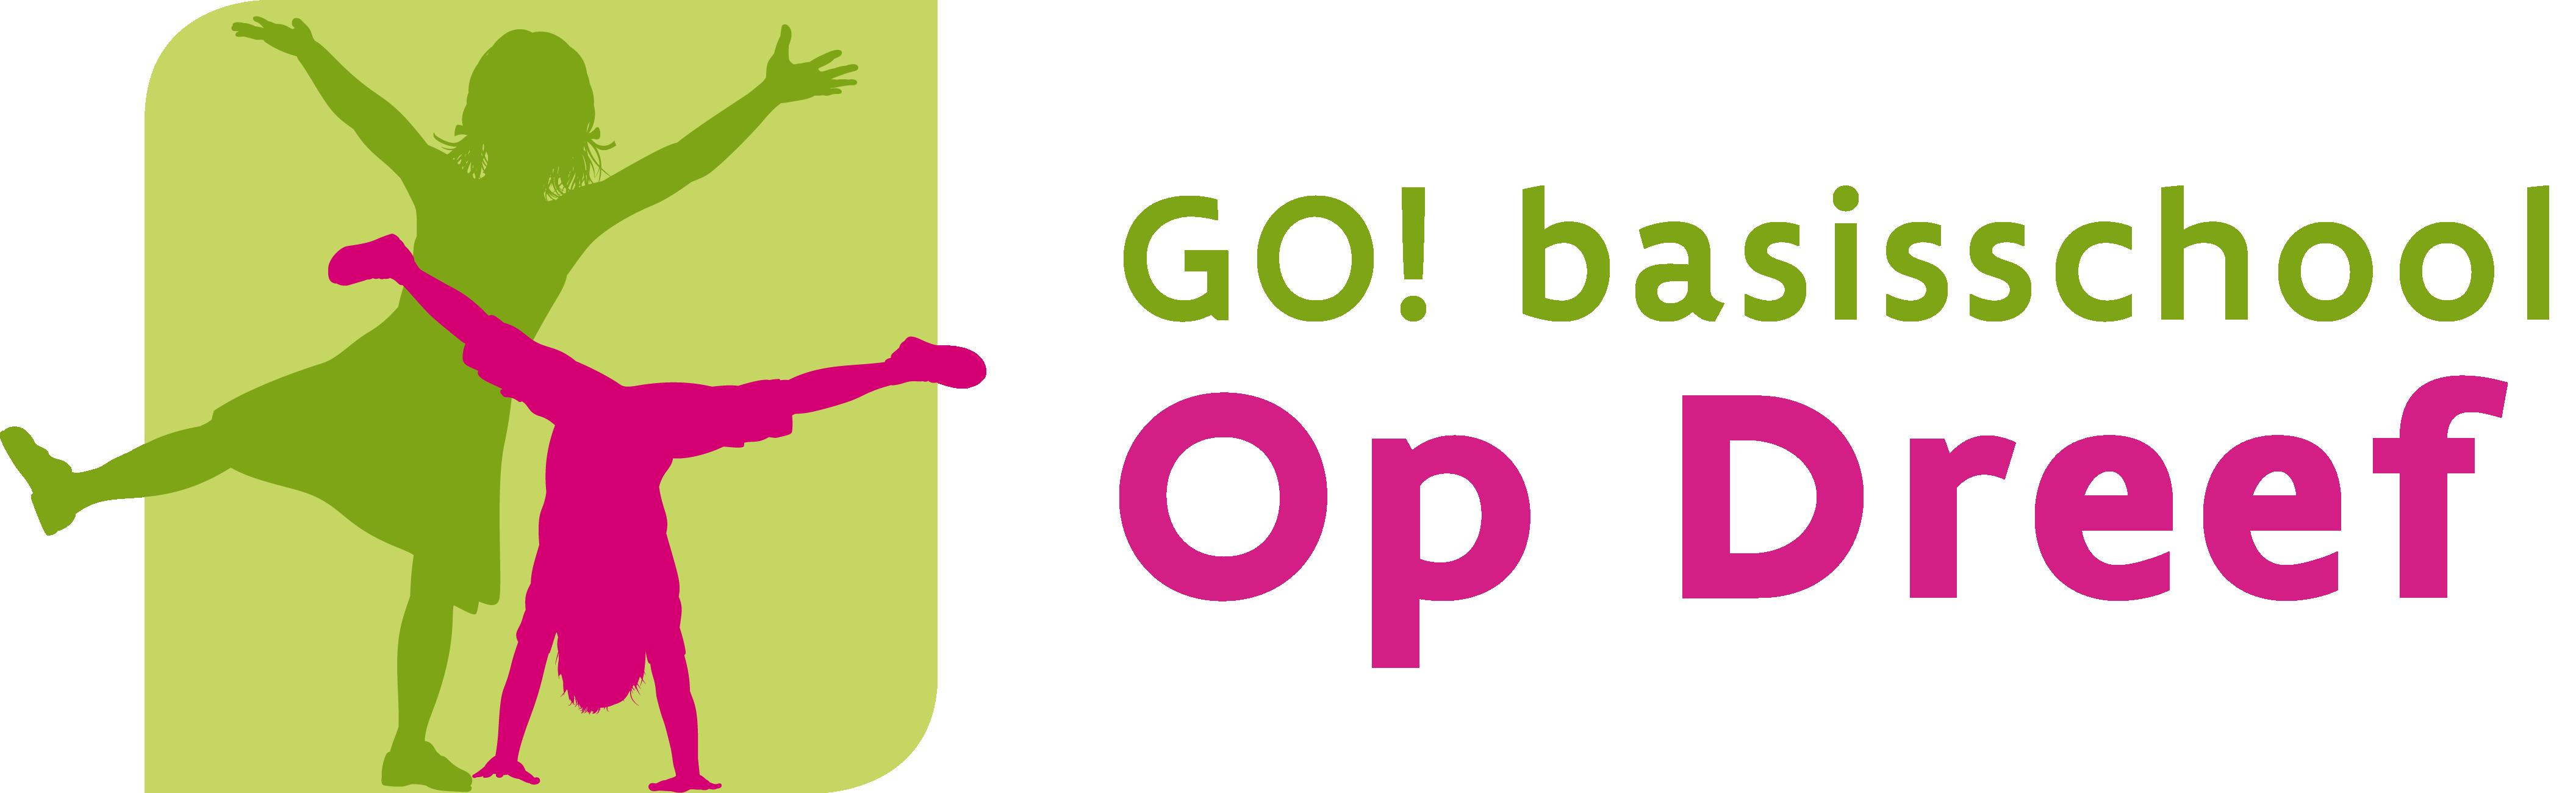 GO! basisschool Melgesdreef